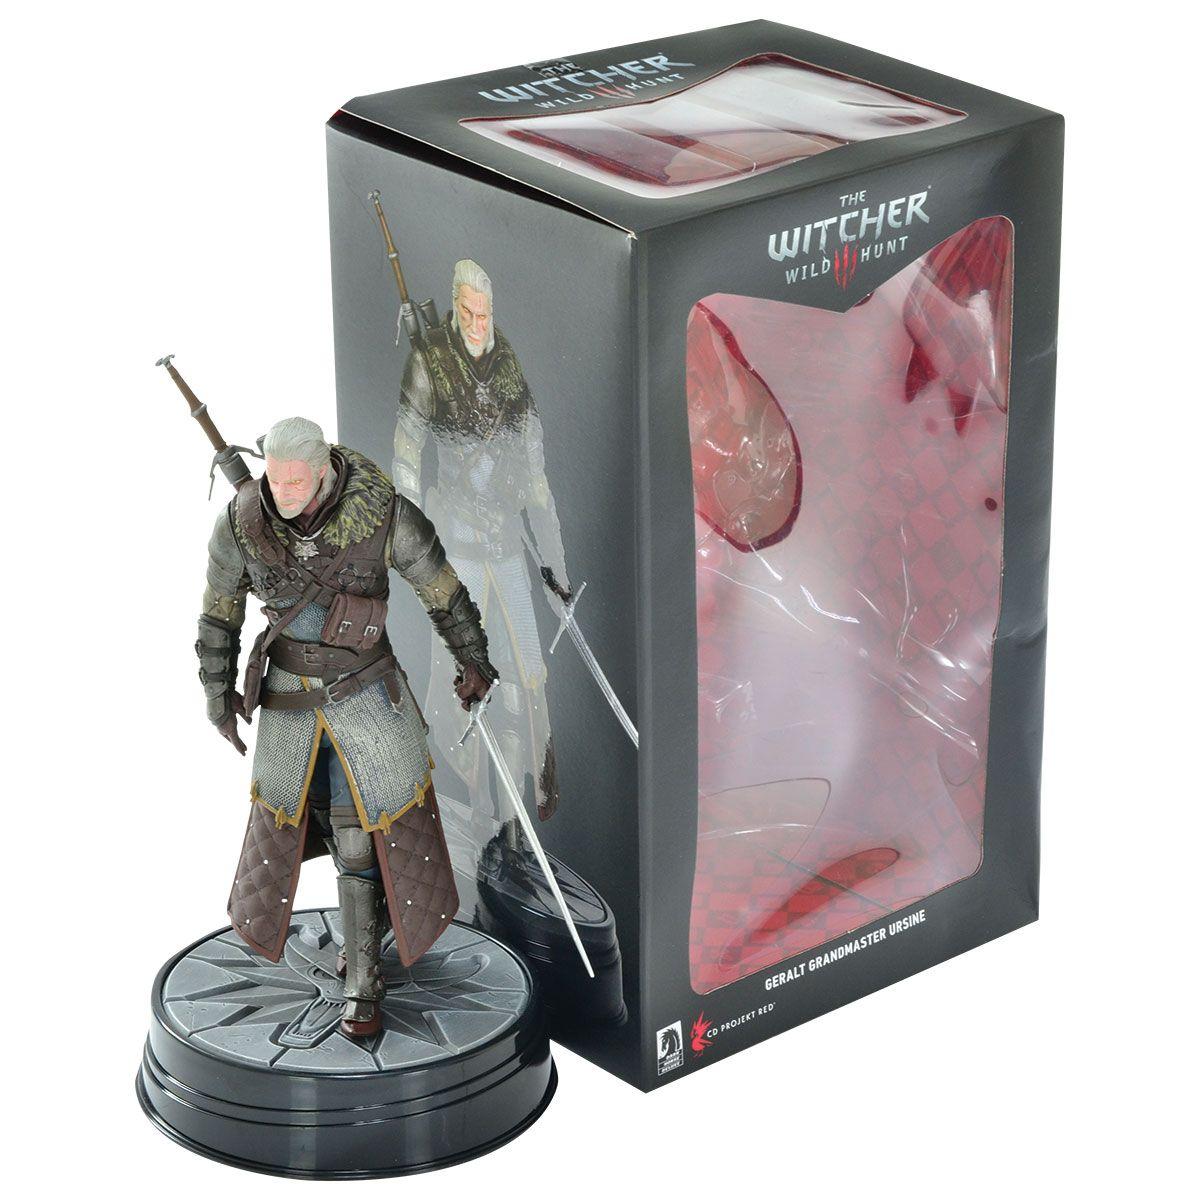 Geralt GrandMaster - The Witcher 3 - Dark Horse Deluxe